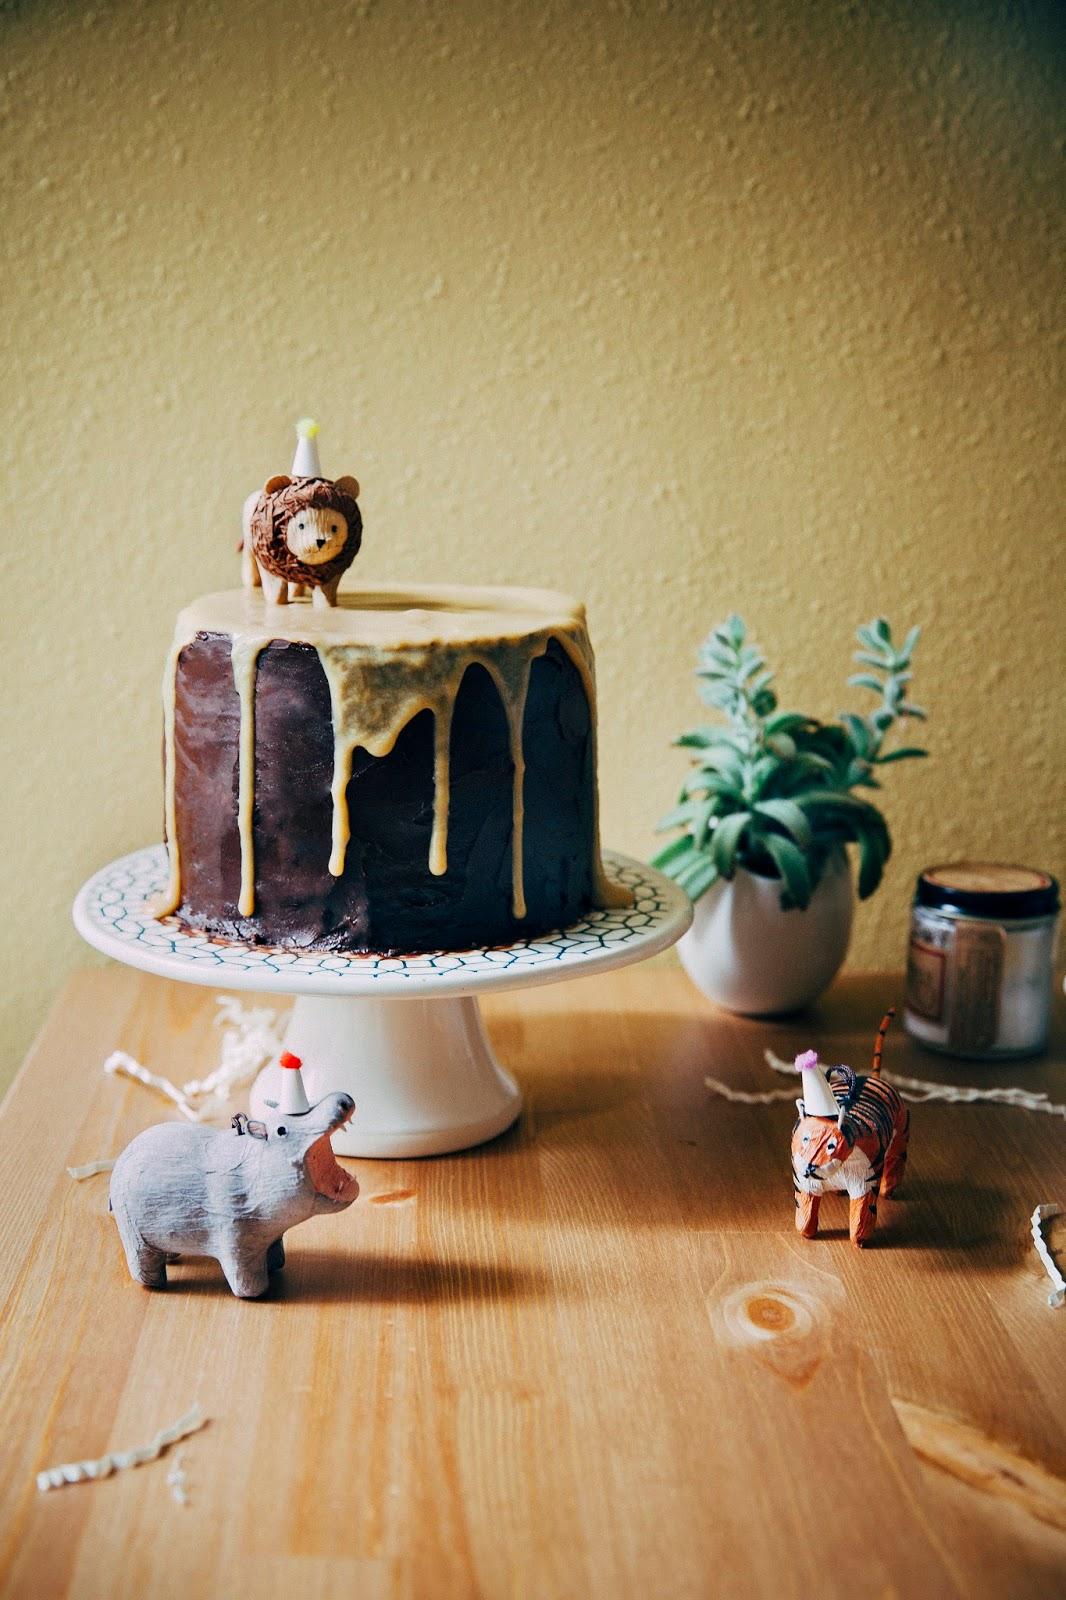 Phenomenal Boozy Yellow Birthday Cake With Chocolate Frosting And Caramelized Personalised Birthday Cards Vishlily Jamesorg